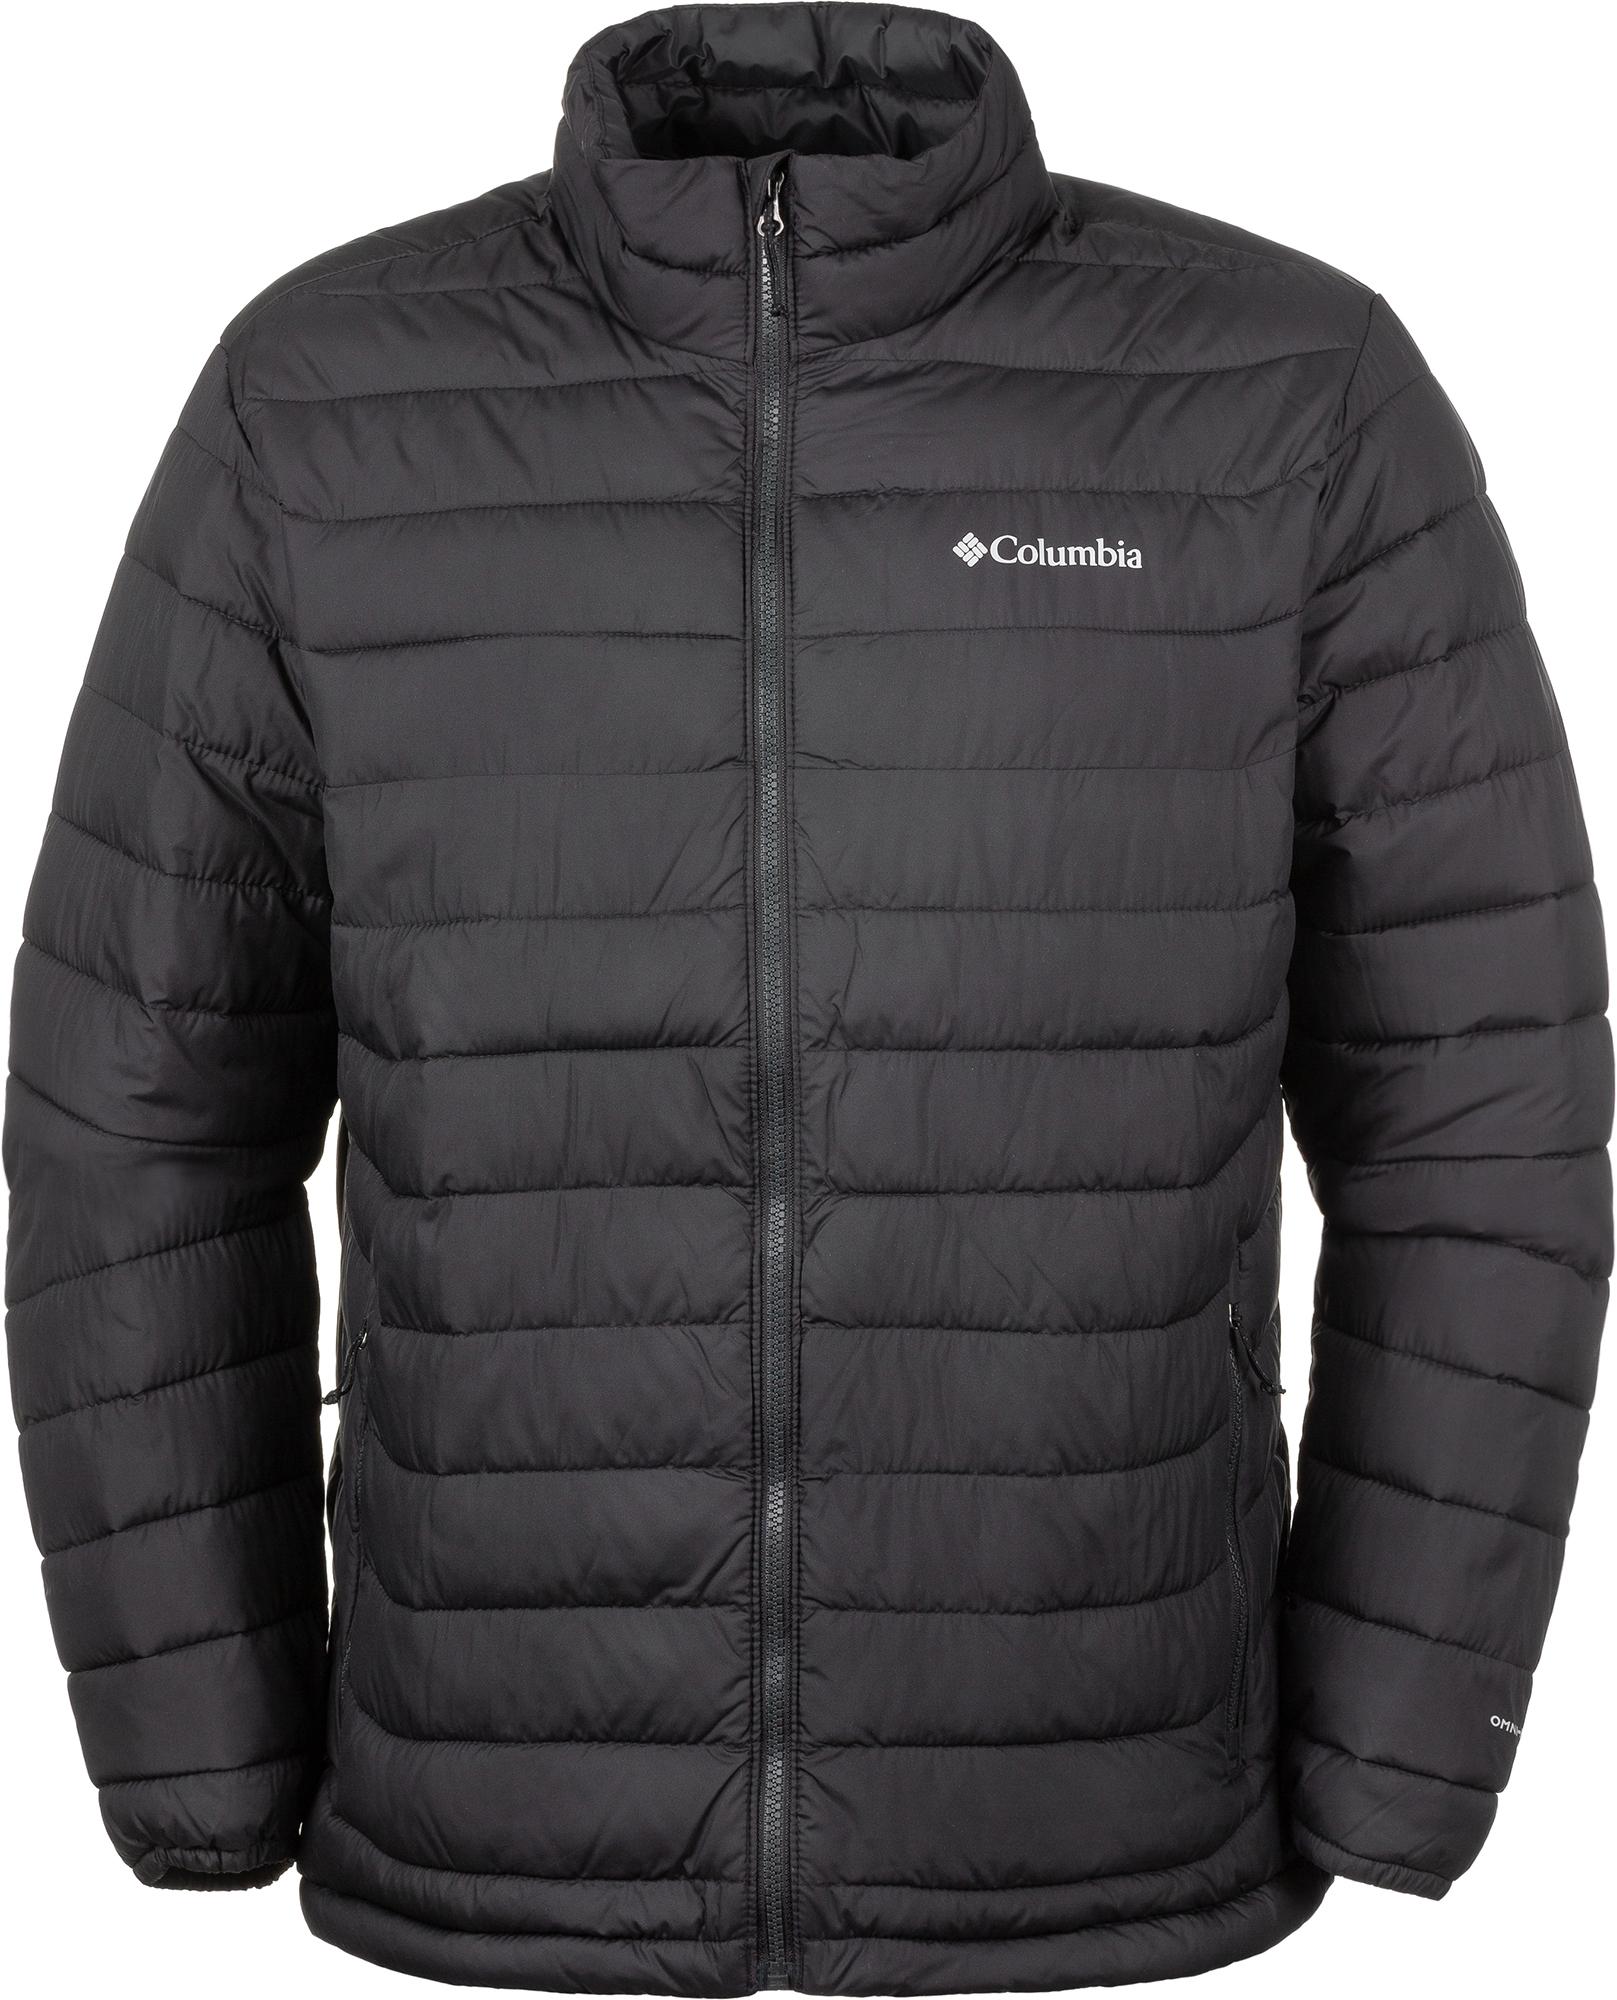 Columbia Куртка утепленная мужская Columbia Powder Lite™, размер 54